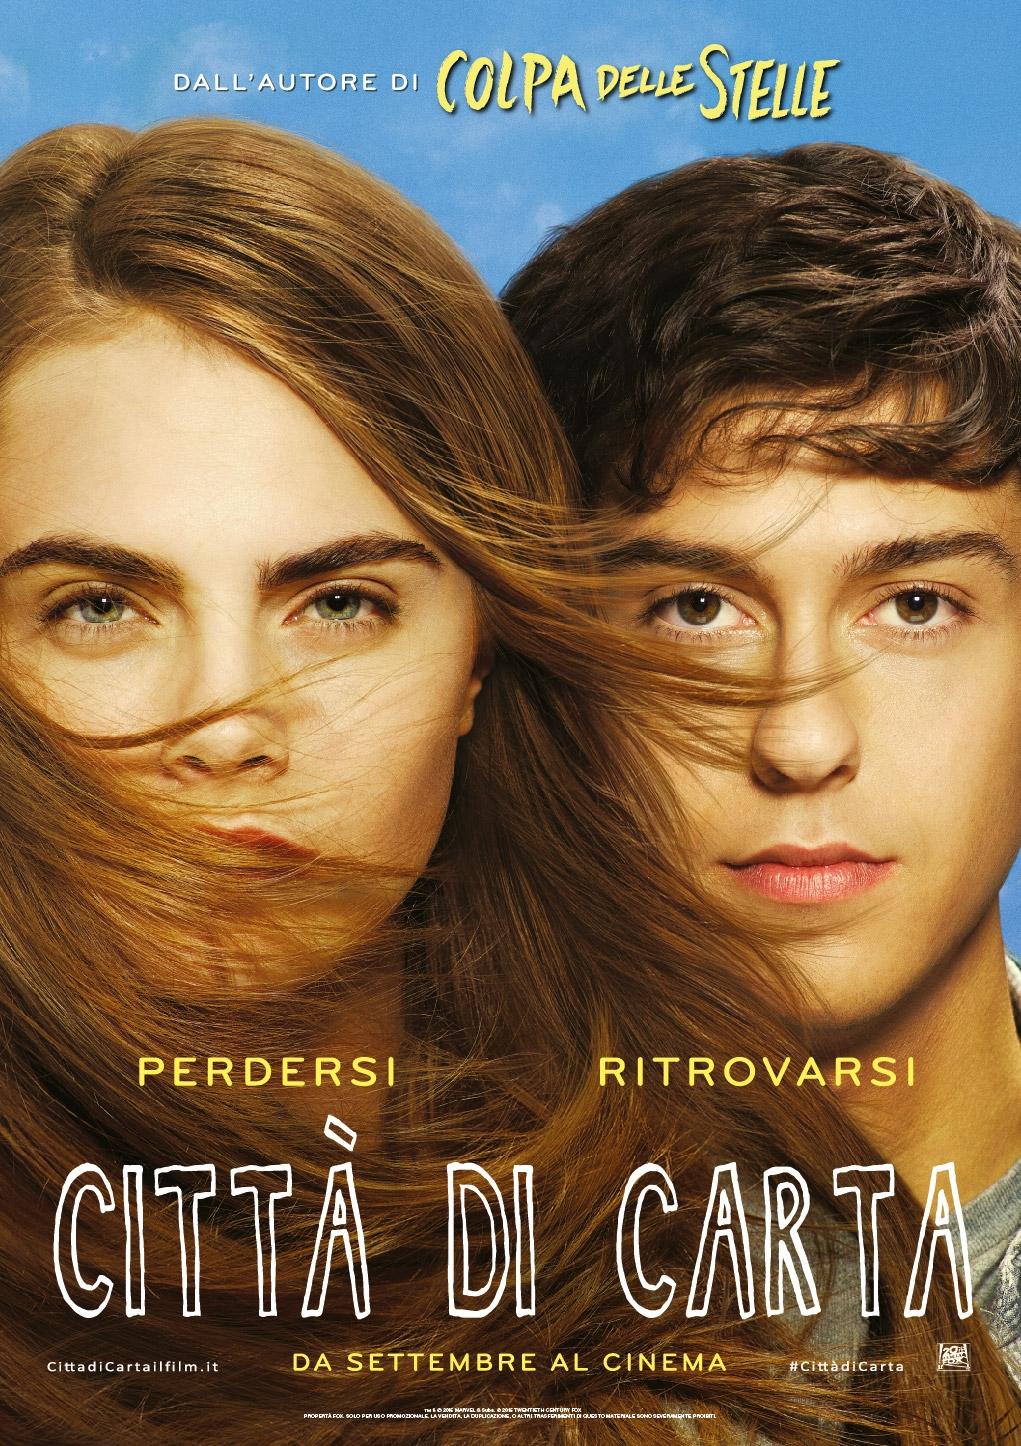 A Giffoni Experience anteprima del film Città di Carta(Paper Towns)